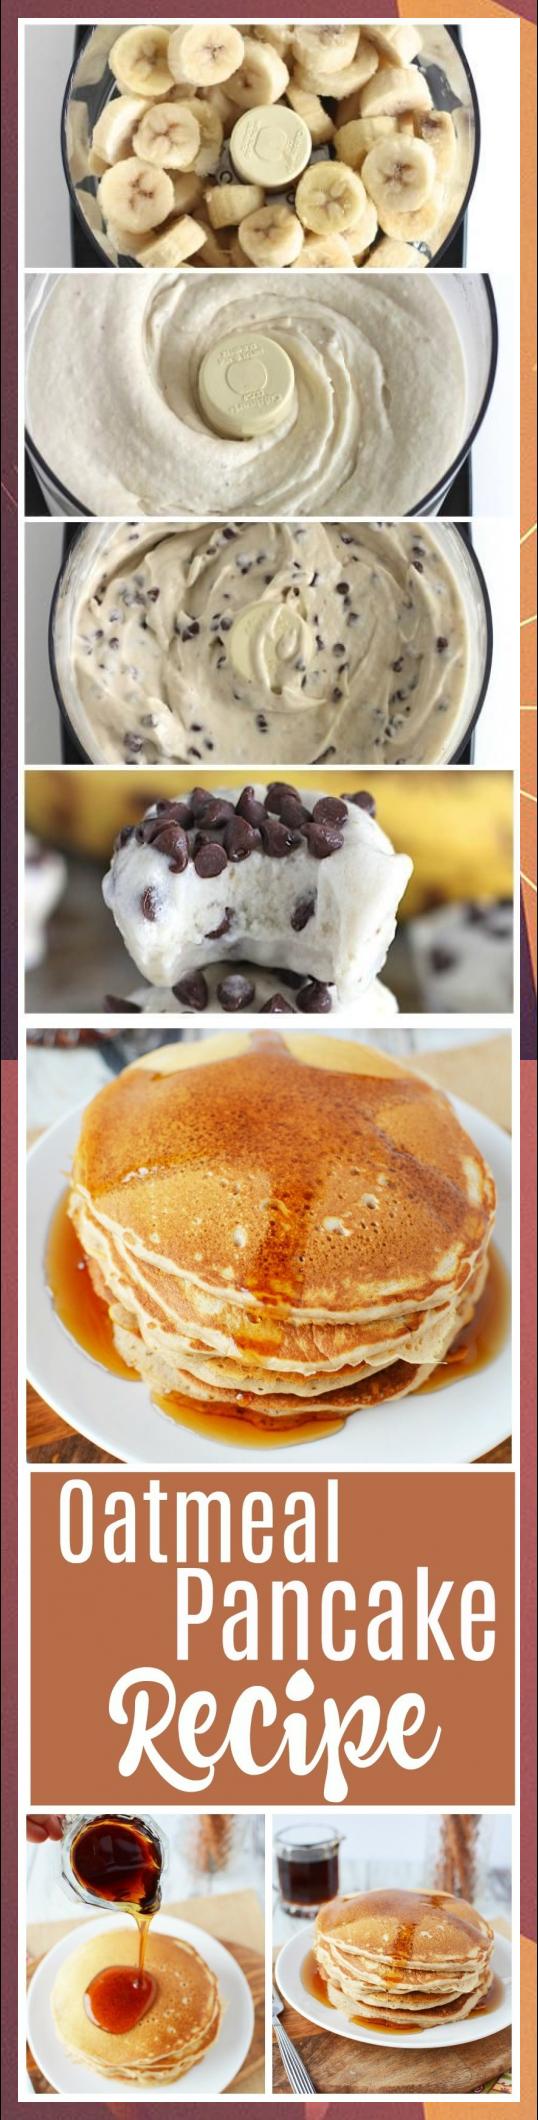 #Banana #Bites #Chip #Chocolate #Cream #Danielle #fitness #Ice #Model #Pascente #Trainer #TwoIngredi...